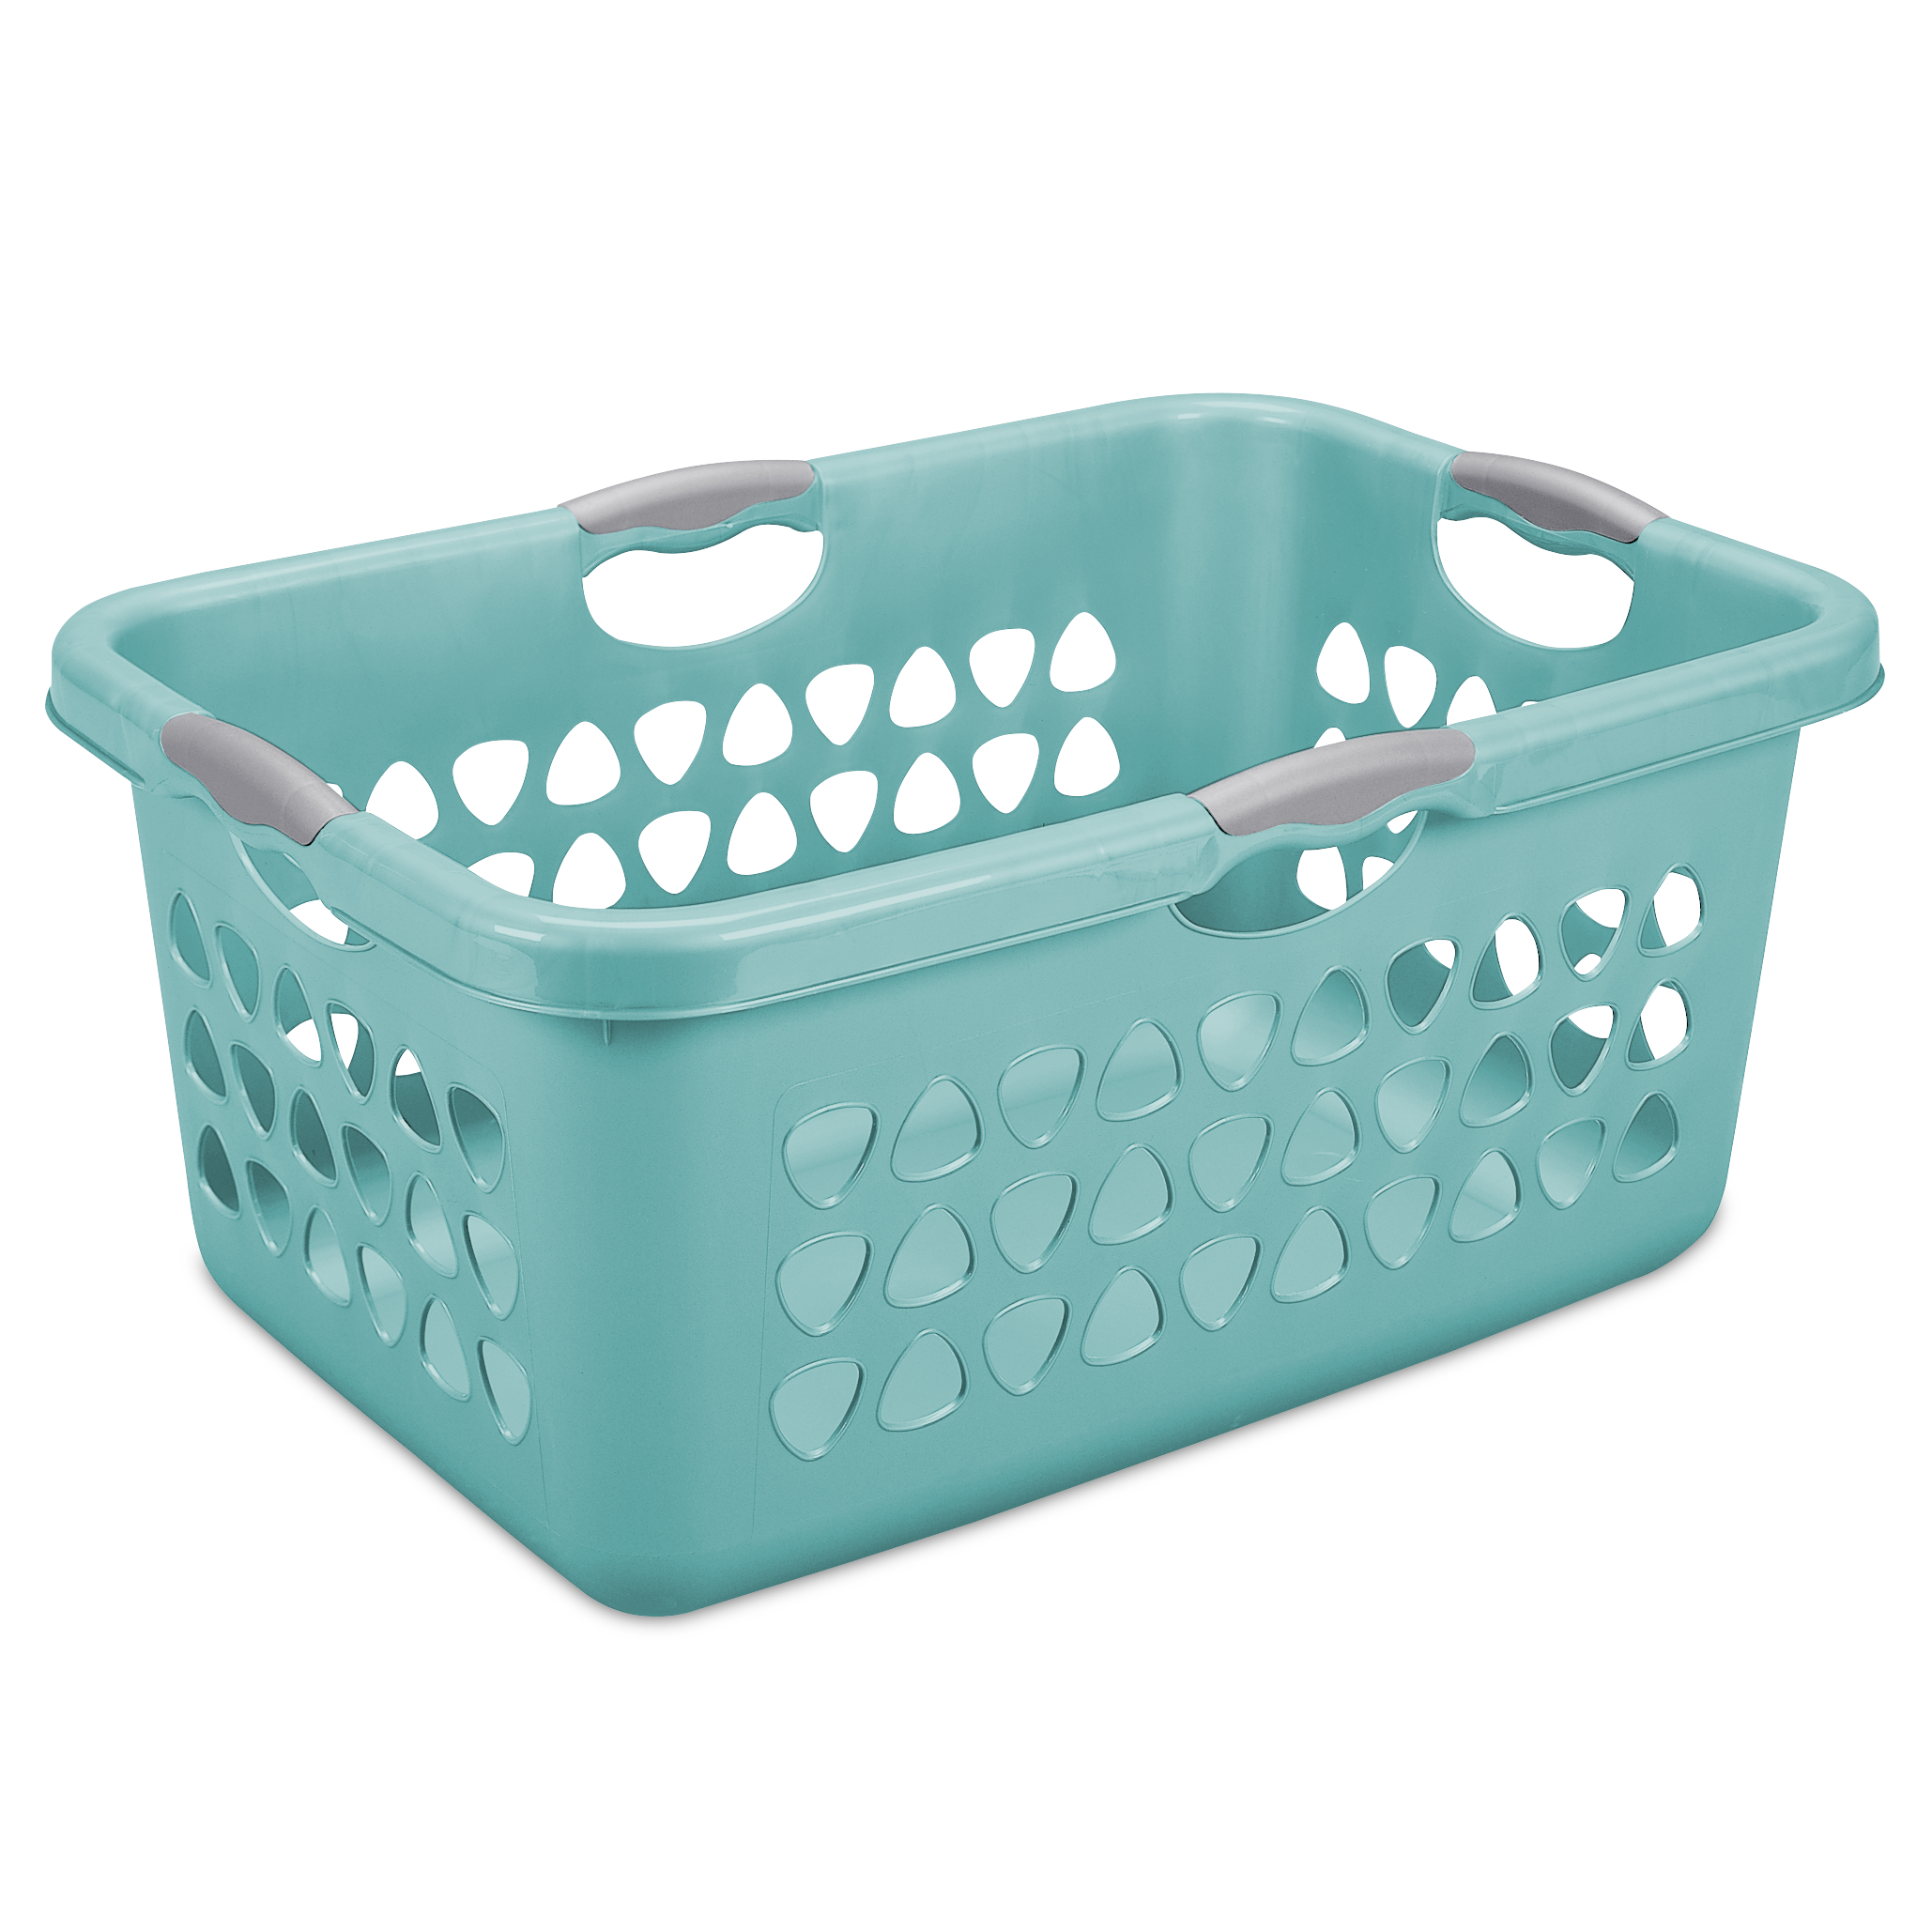 Sterilite Bushel Ultra Laundry Basket, Teal Splash (Available in Set of 6 or Single Unit)